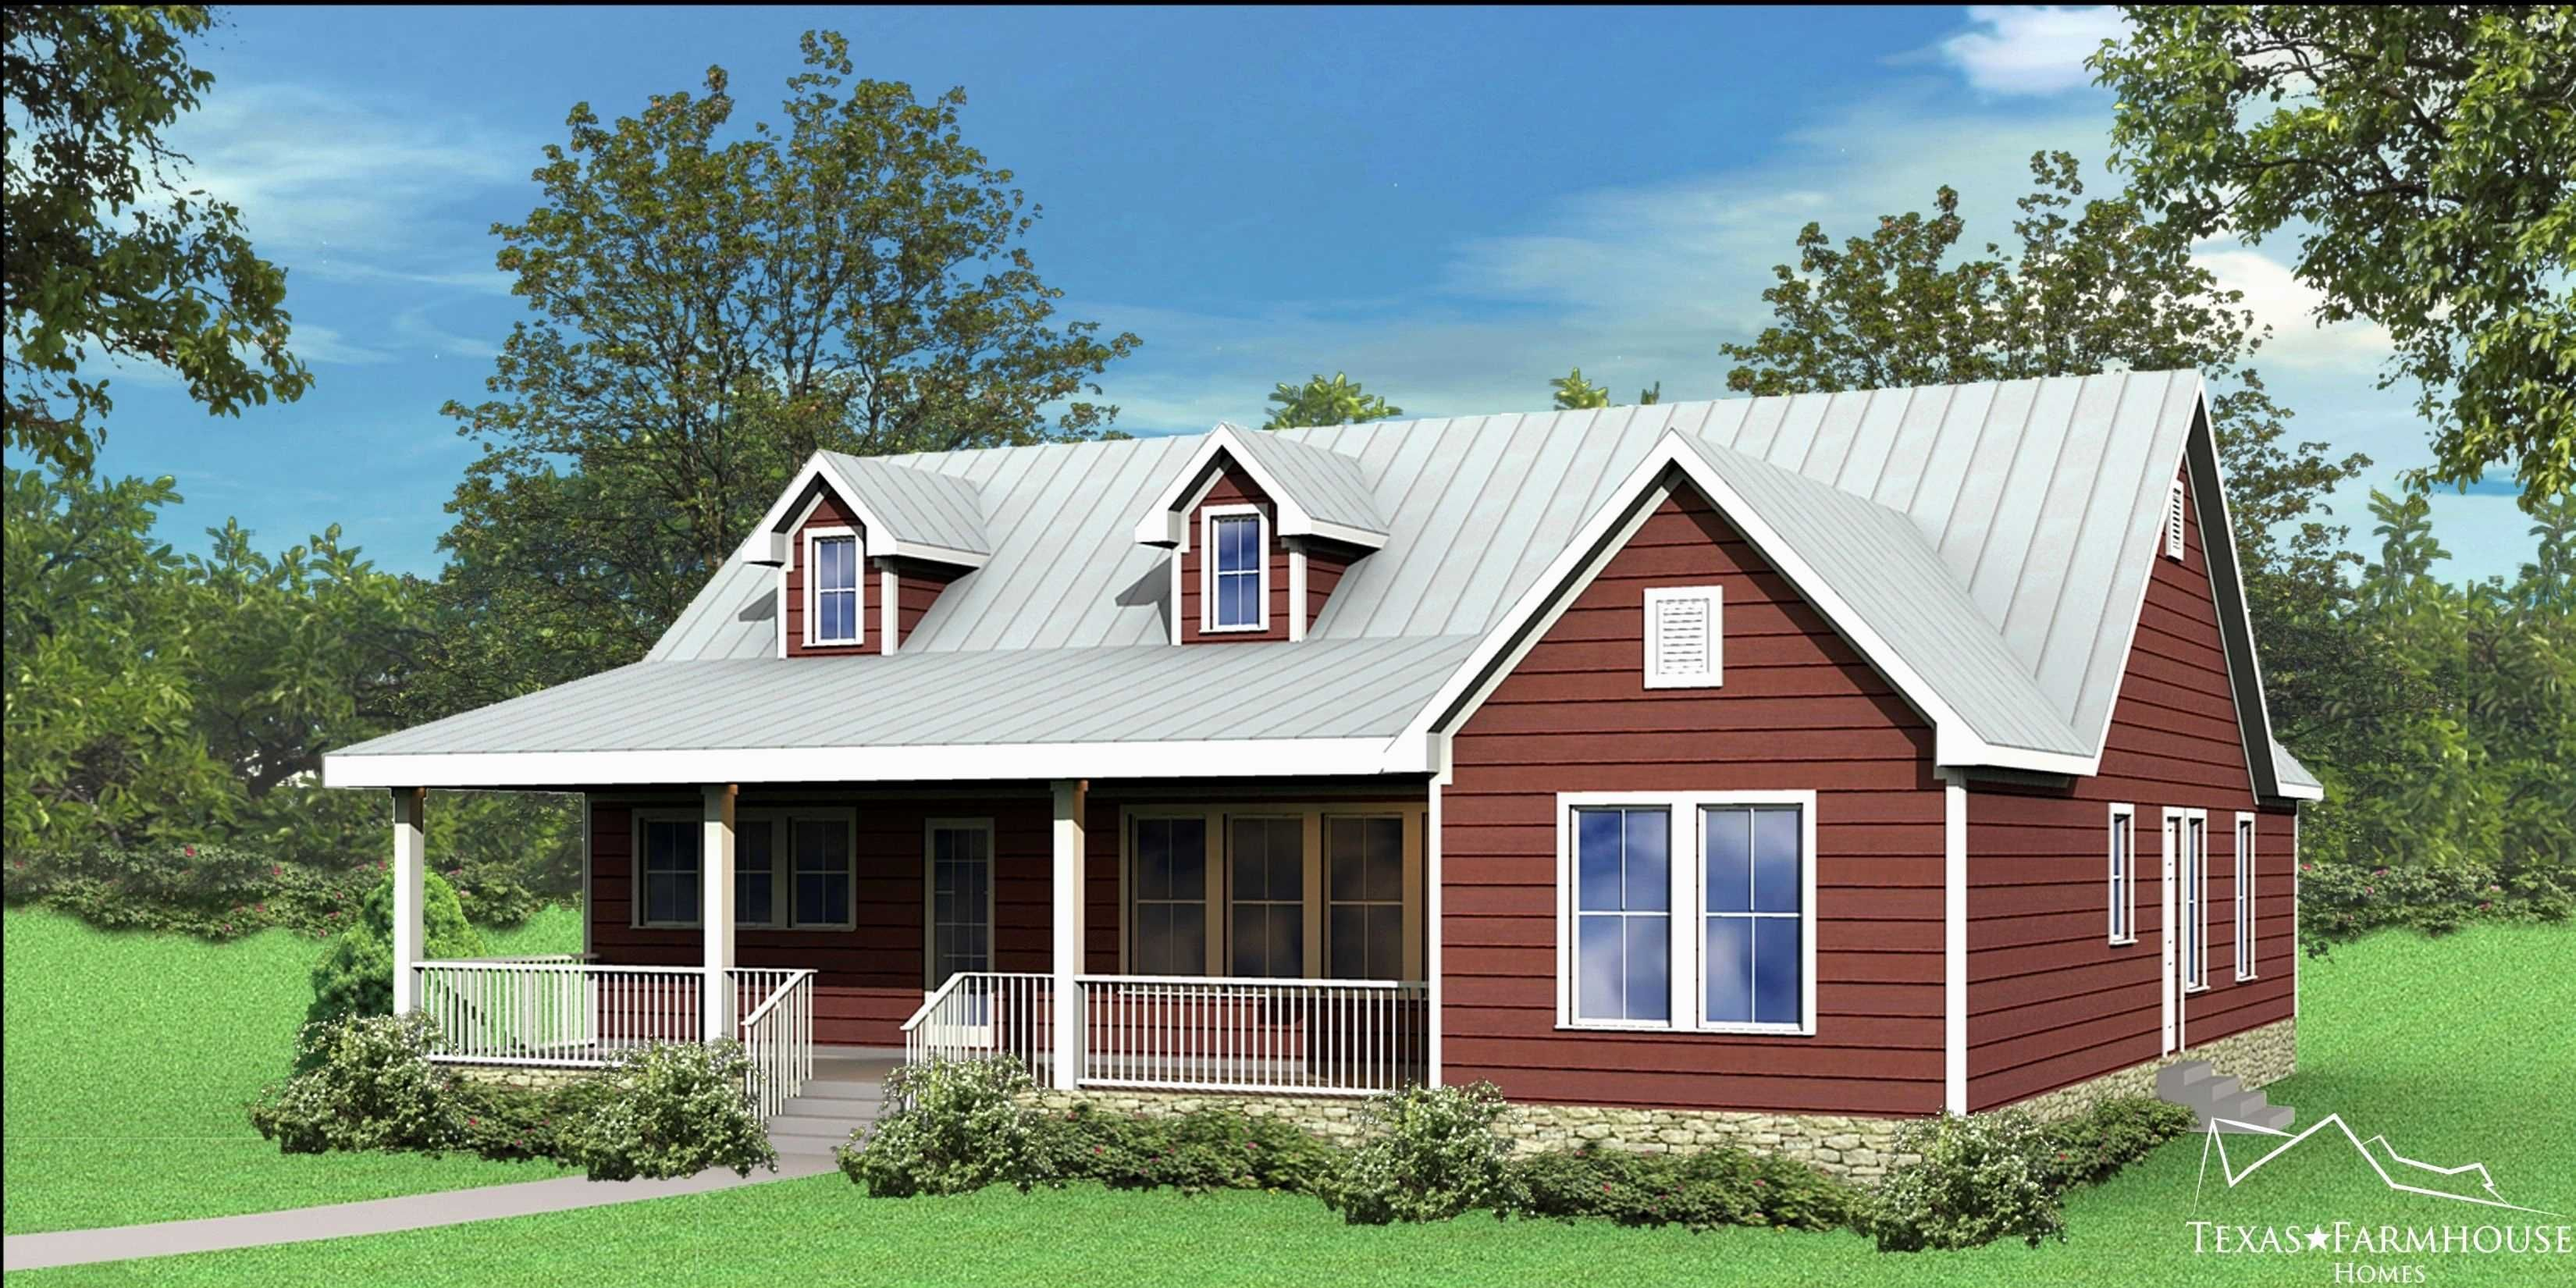 Inspirational Texas Farmhouse For Sale Farmhouse Style House Farmhouse Plans Farmhouse Architecture